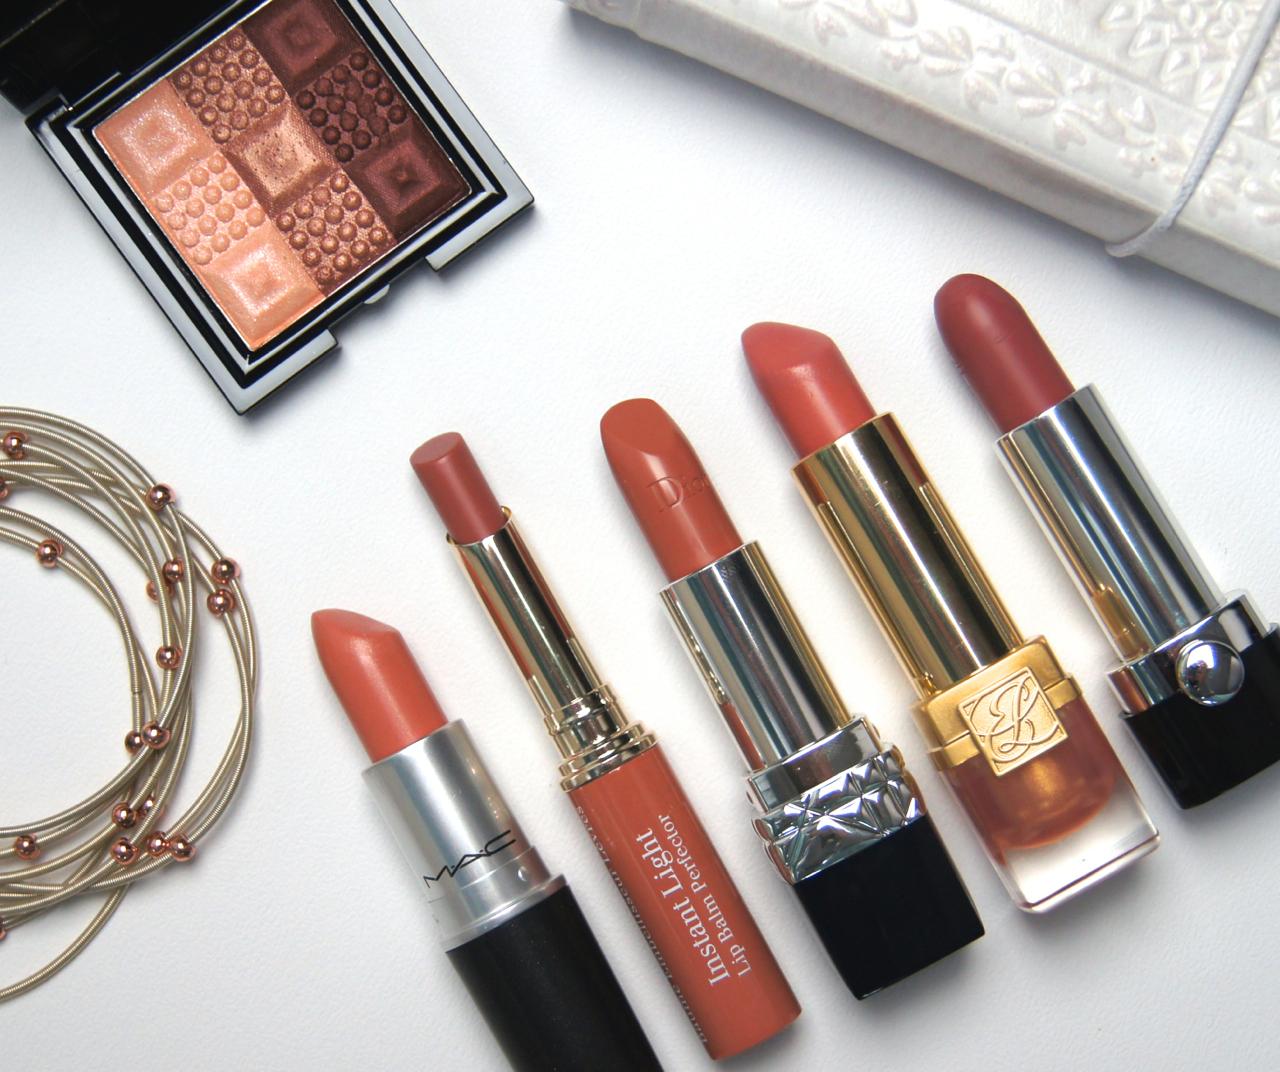 top 5 best high end nude lipsticks dior mac clarins marc jacobs estee lauder